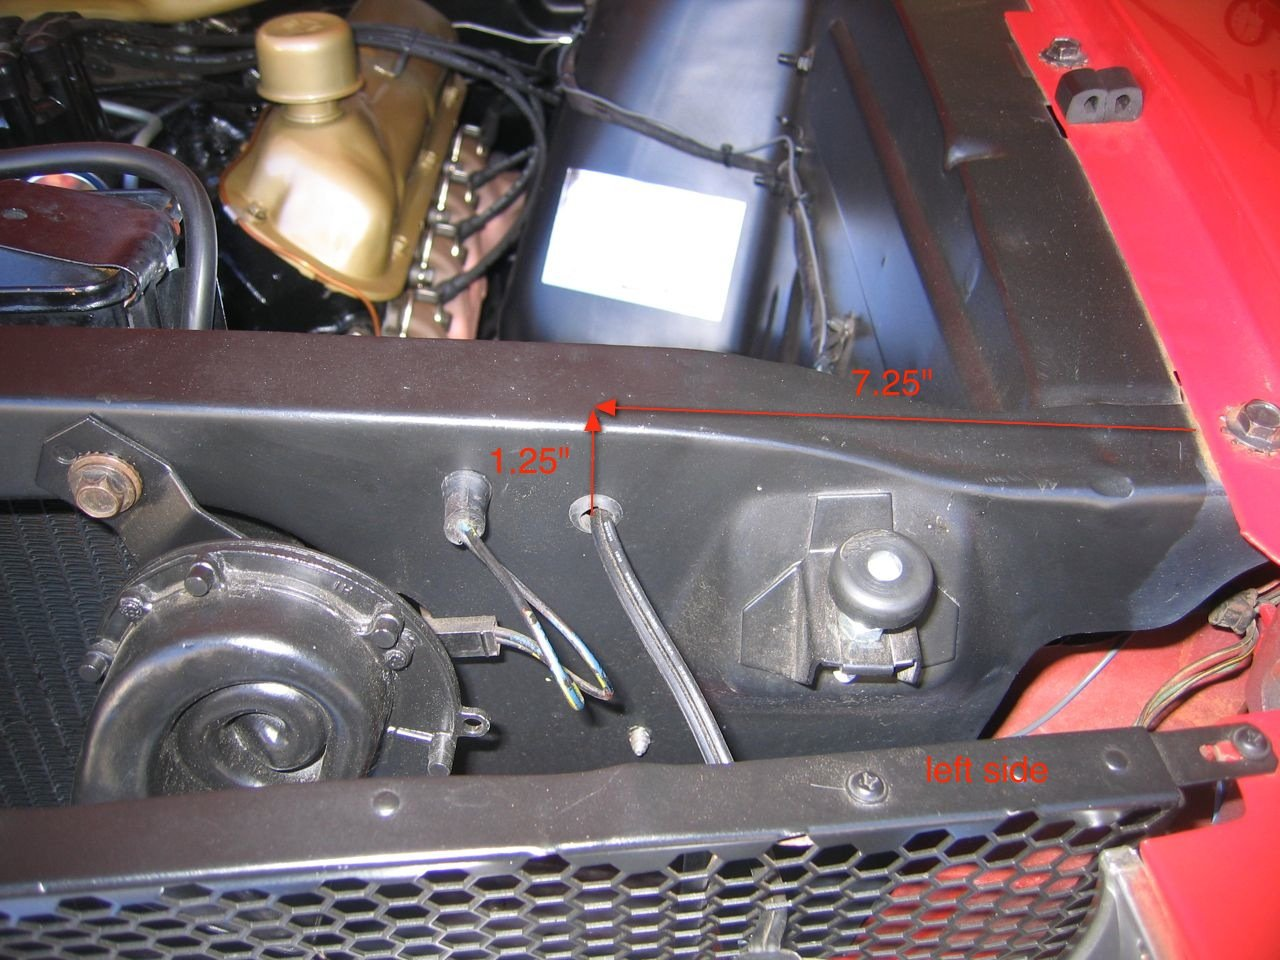 1965 Ford Mustang Starter Wiring Diagram 65 Fog Light Install Ford Mustang Forum